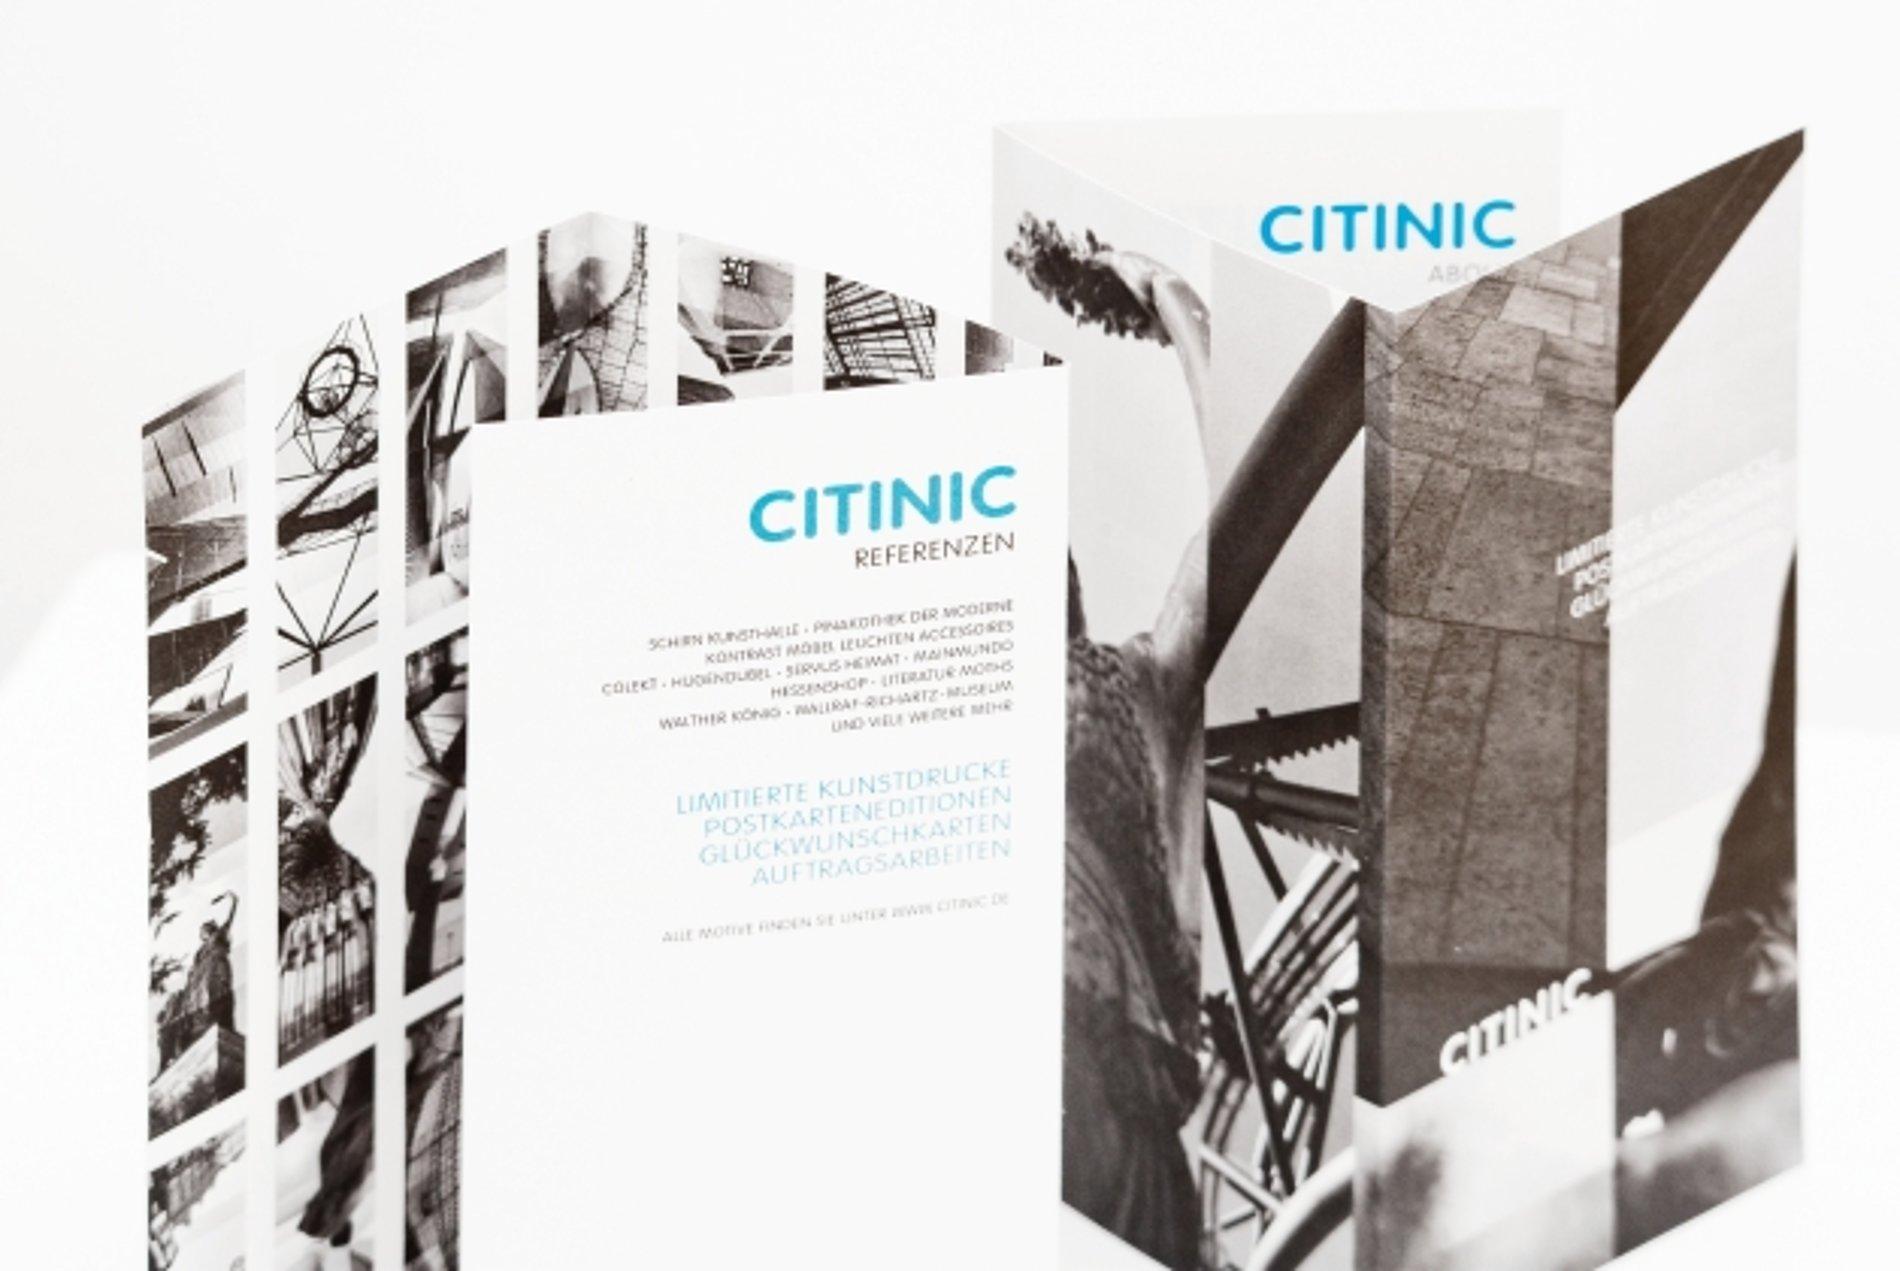 CITINIC | Red Dot Design Award